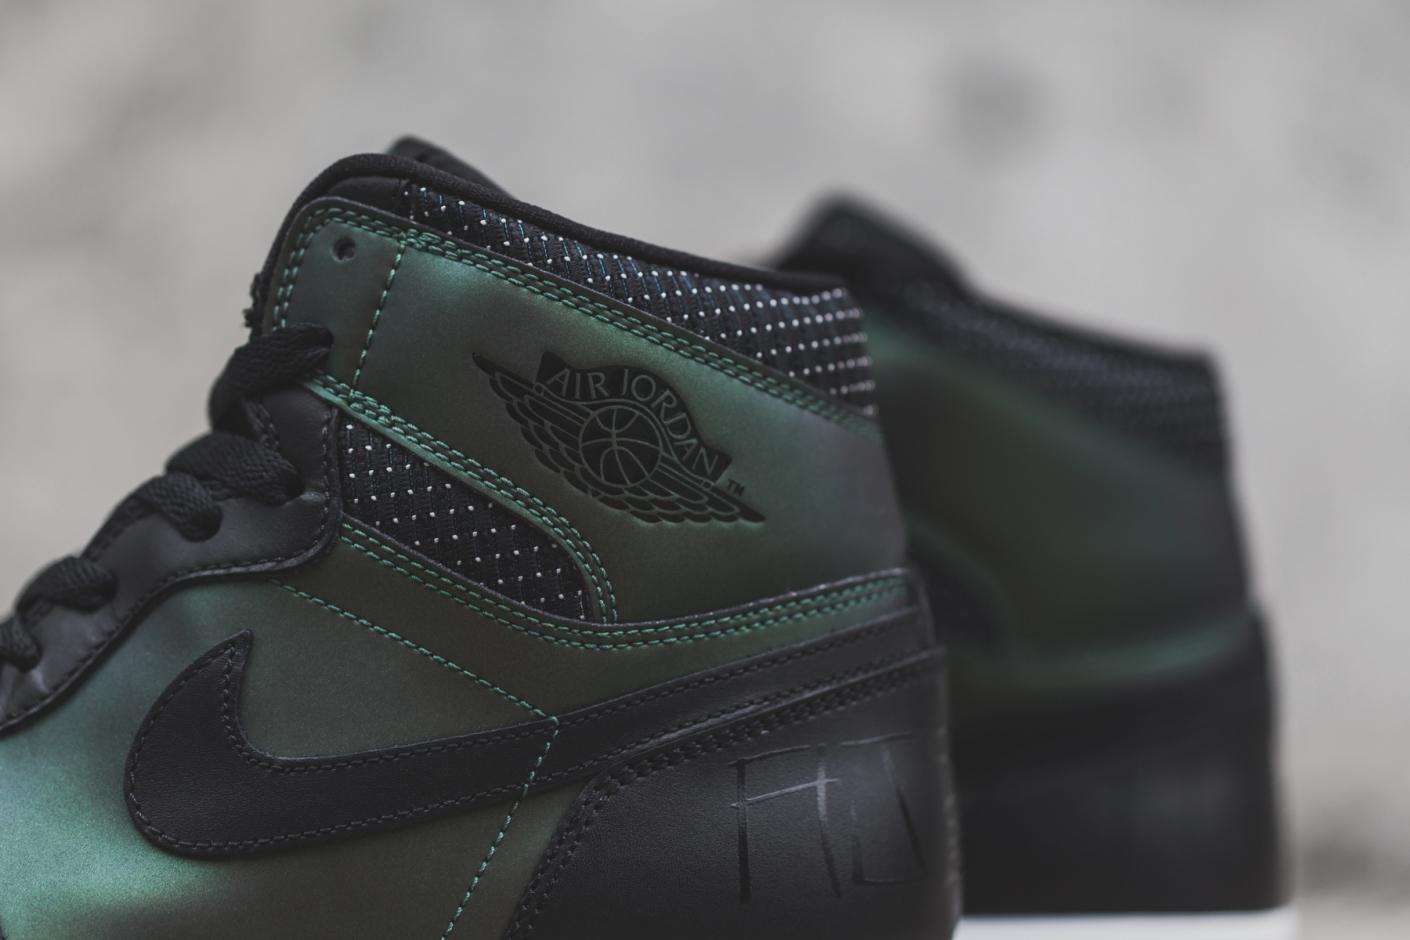 Nike SB x Air Jordan 1 by Craig Stecyk 4